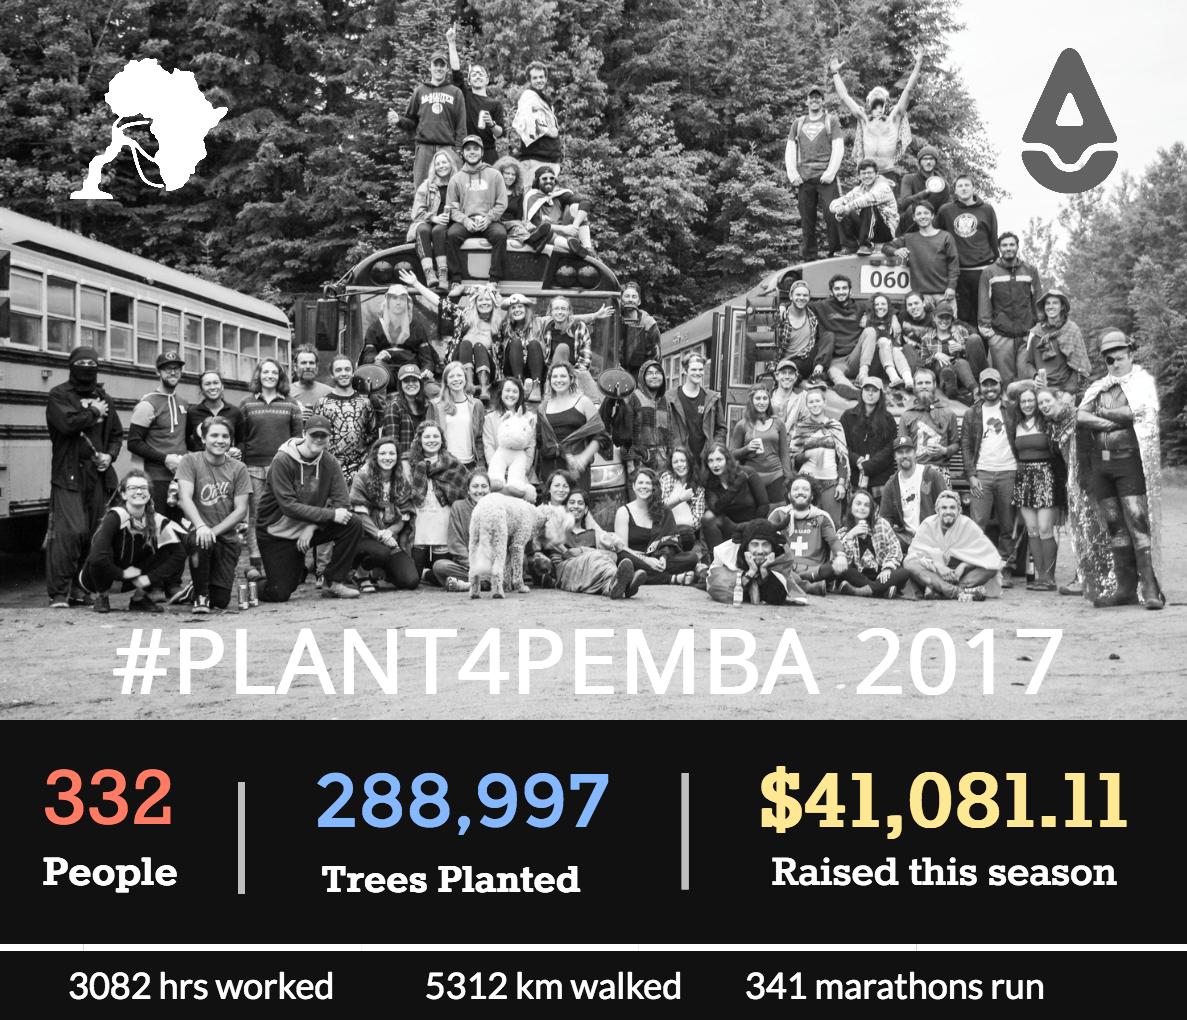 Plant4Pemba Info Graphic.png